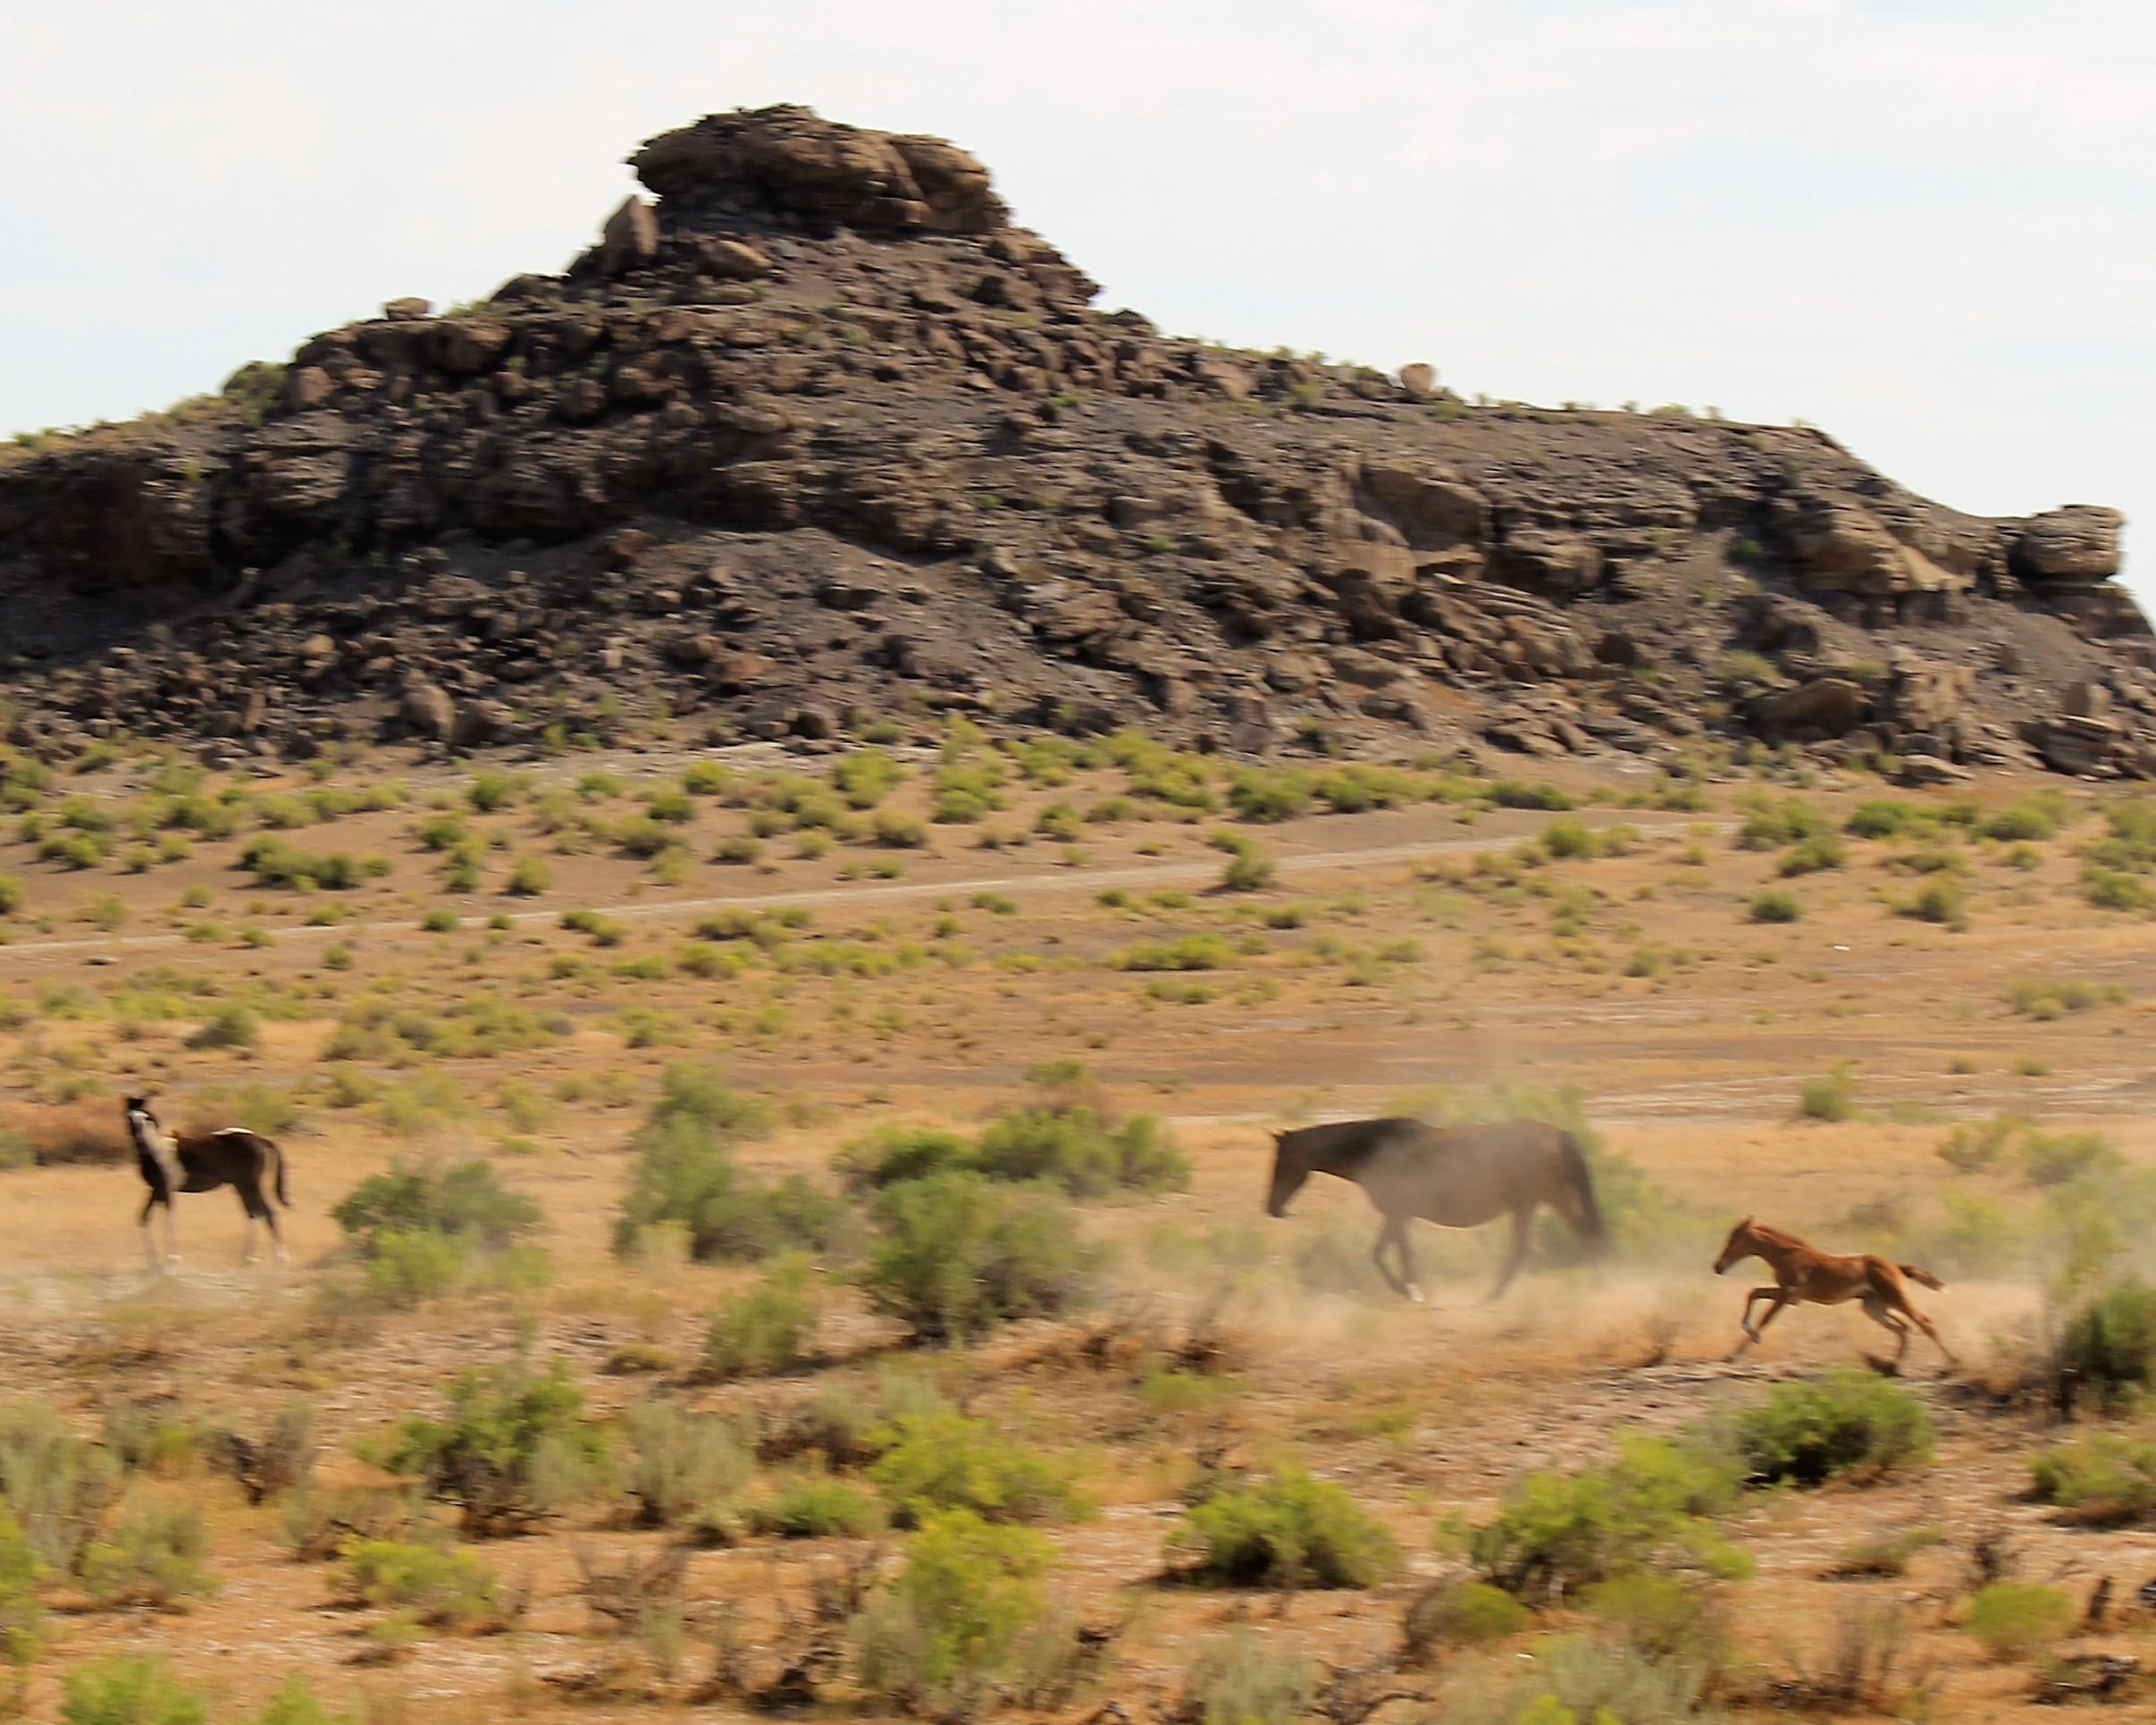 Young foal racing through the herd